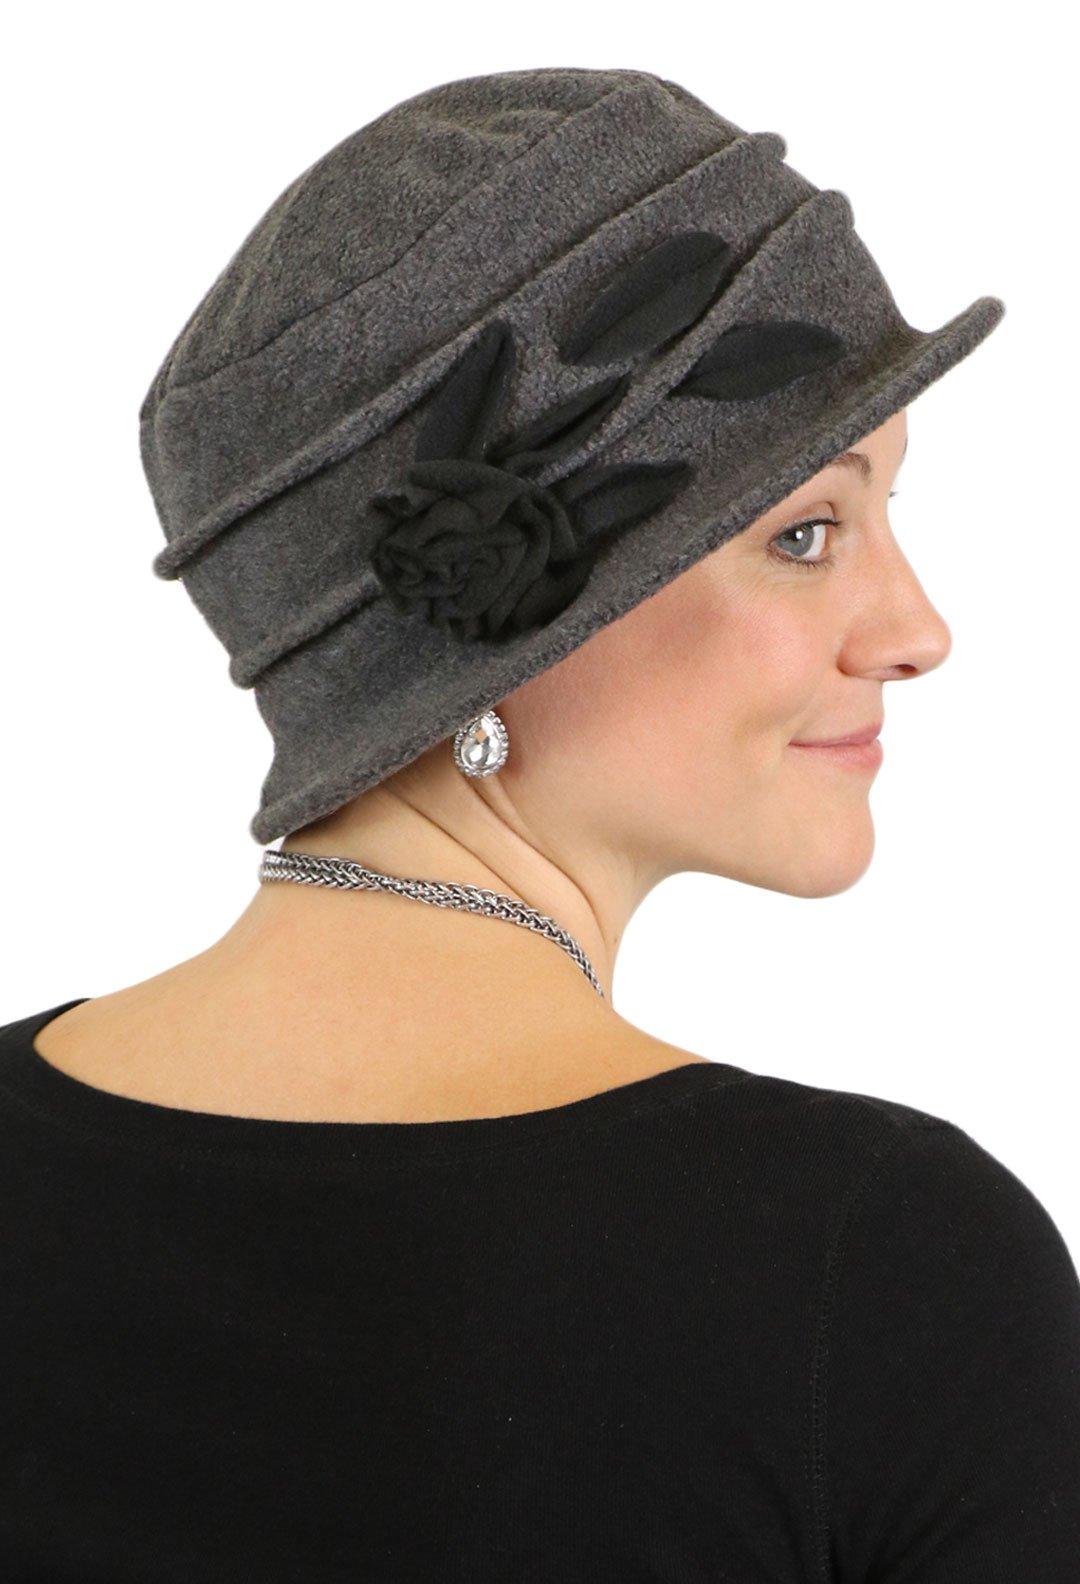 04625046d56 Fleece Hats for Women Cloche Cancer Headwear Chemo Cap Hair Loss Ladies  (Grey with Black)